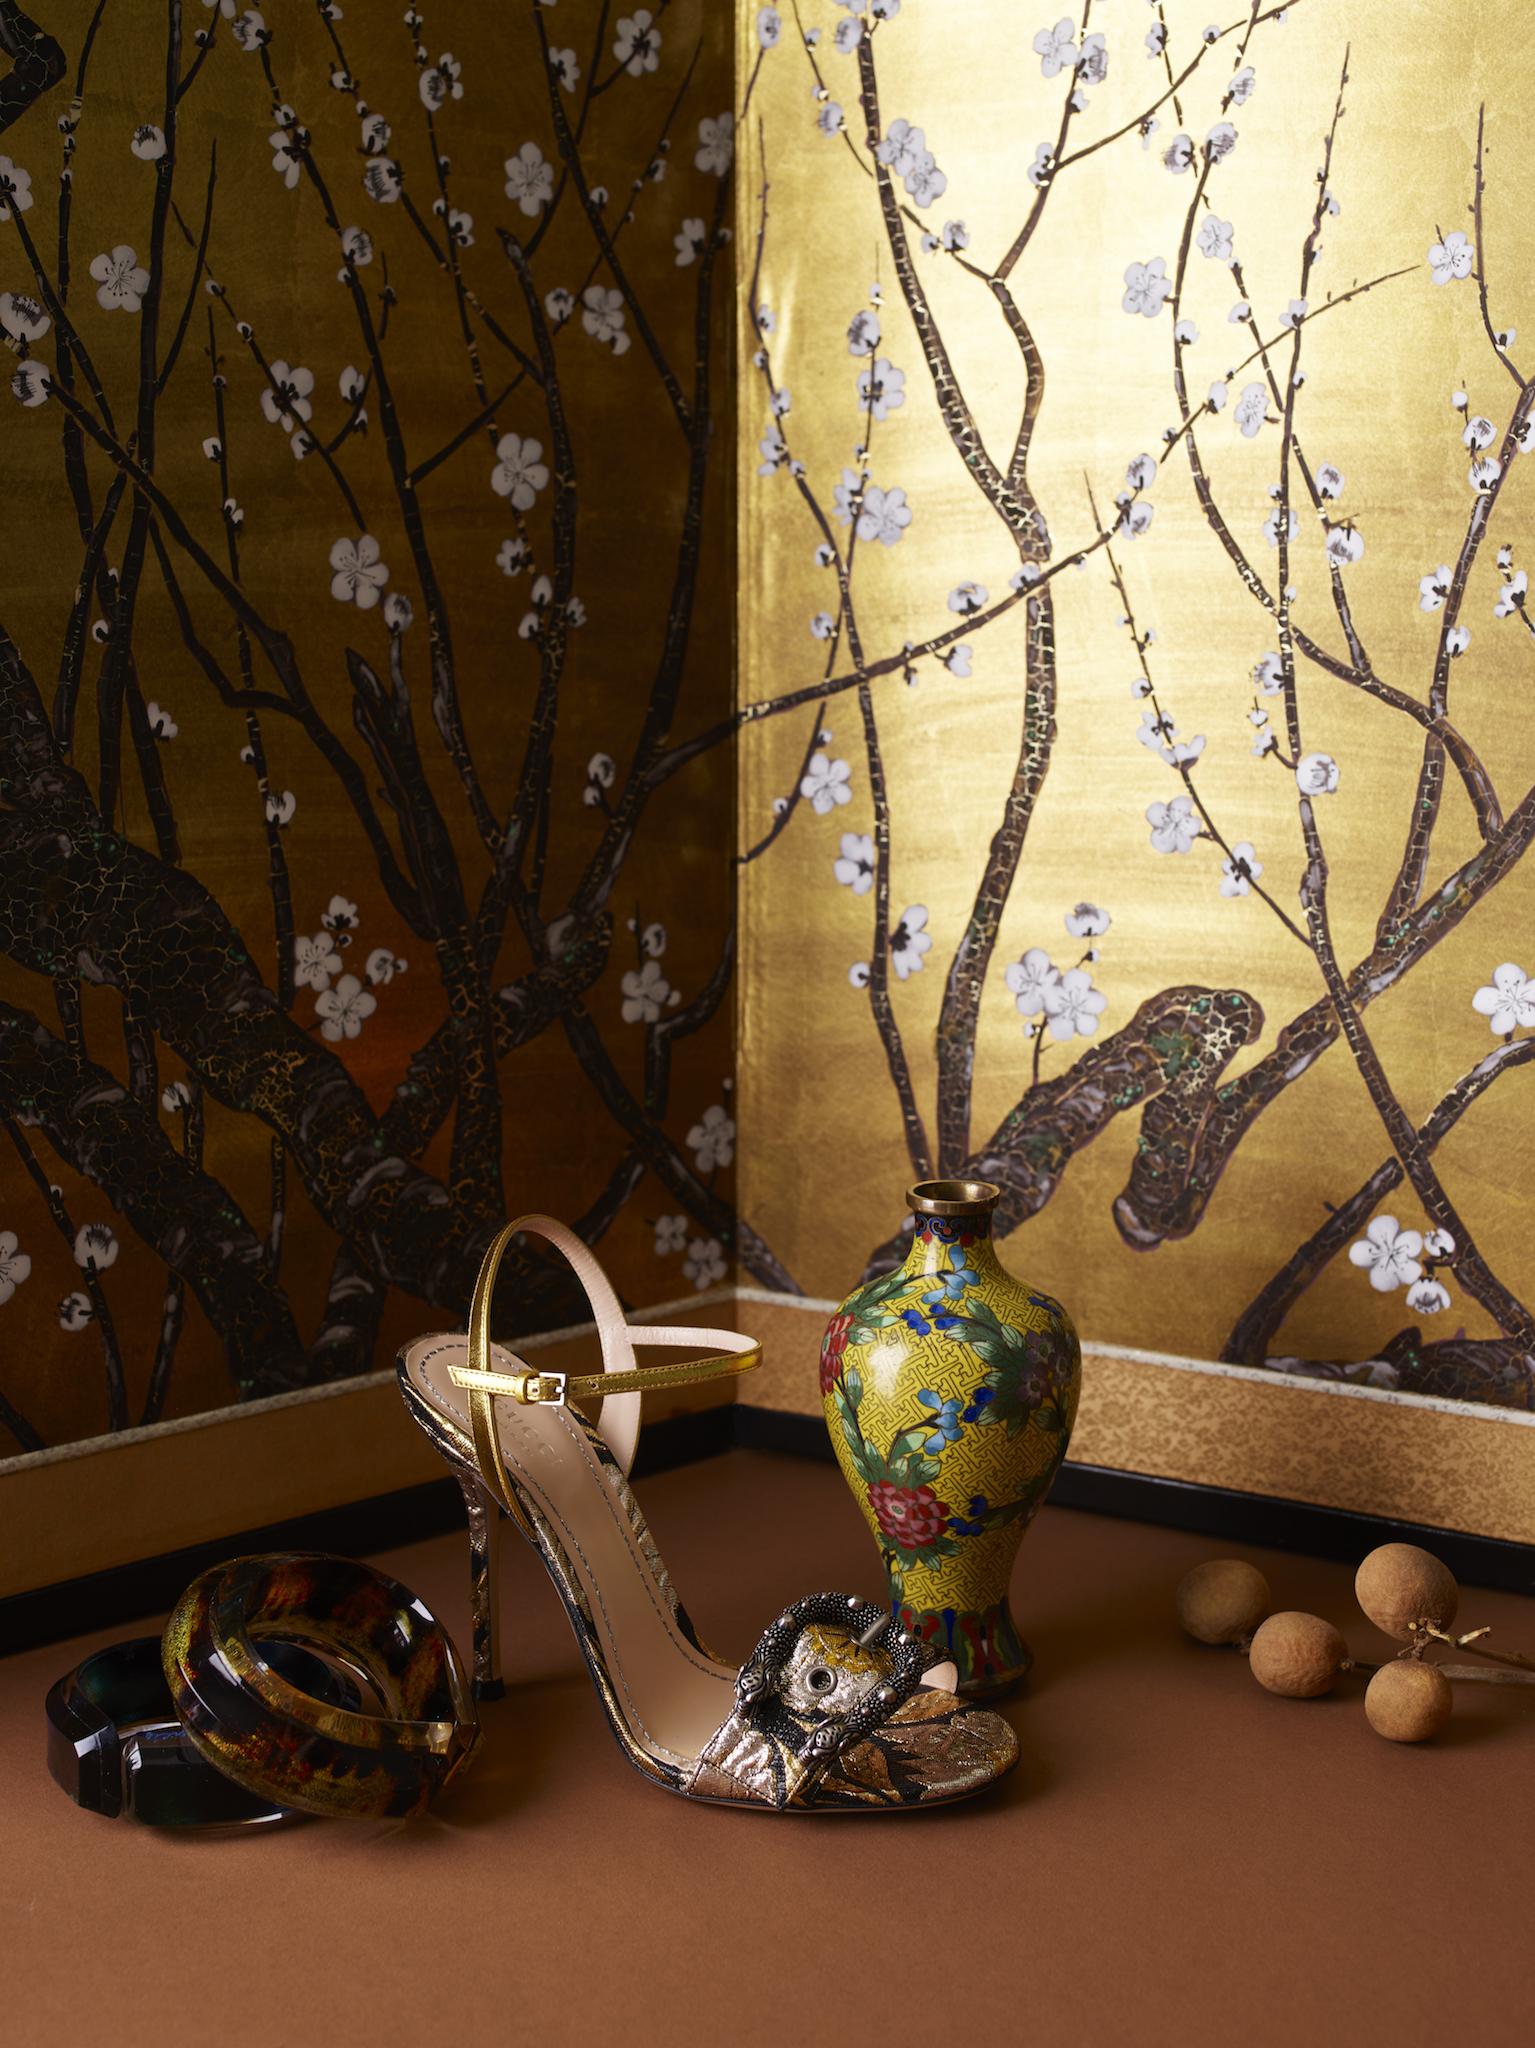 Sko: GUCCI Armbånd: JOYCE FRANCIS / Elleville Design Antik vase / Rydeng Oslo